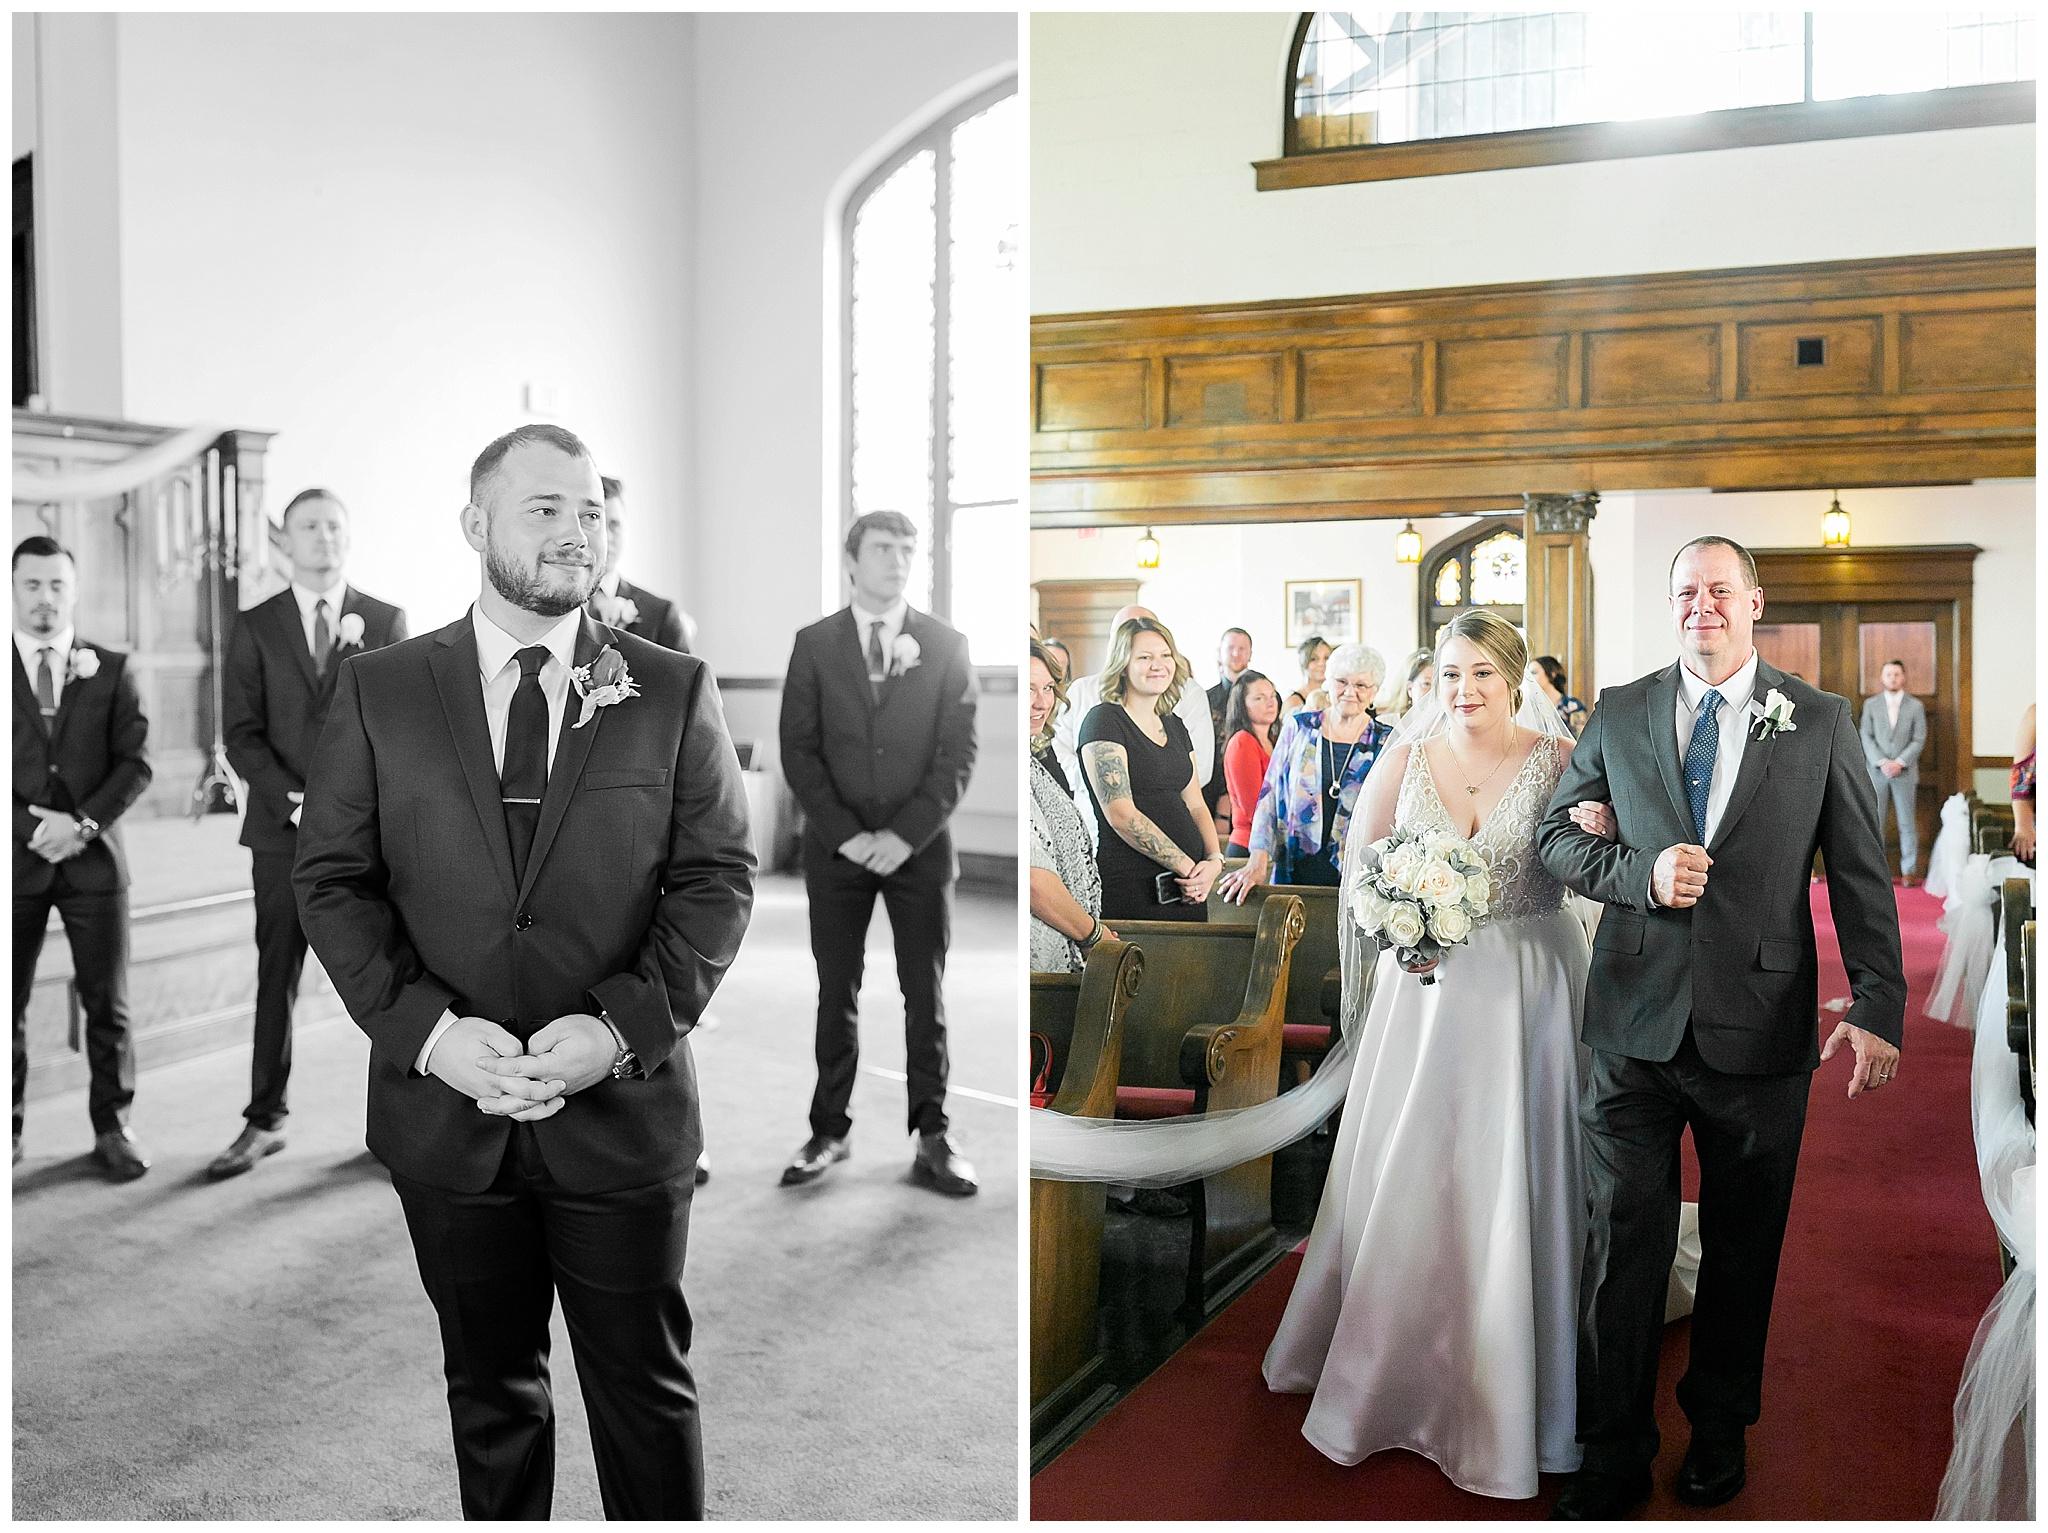 la_casa_grande_wedding_beloit_wisconsin_caynay_photo_0010.jpg